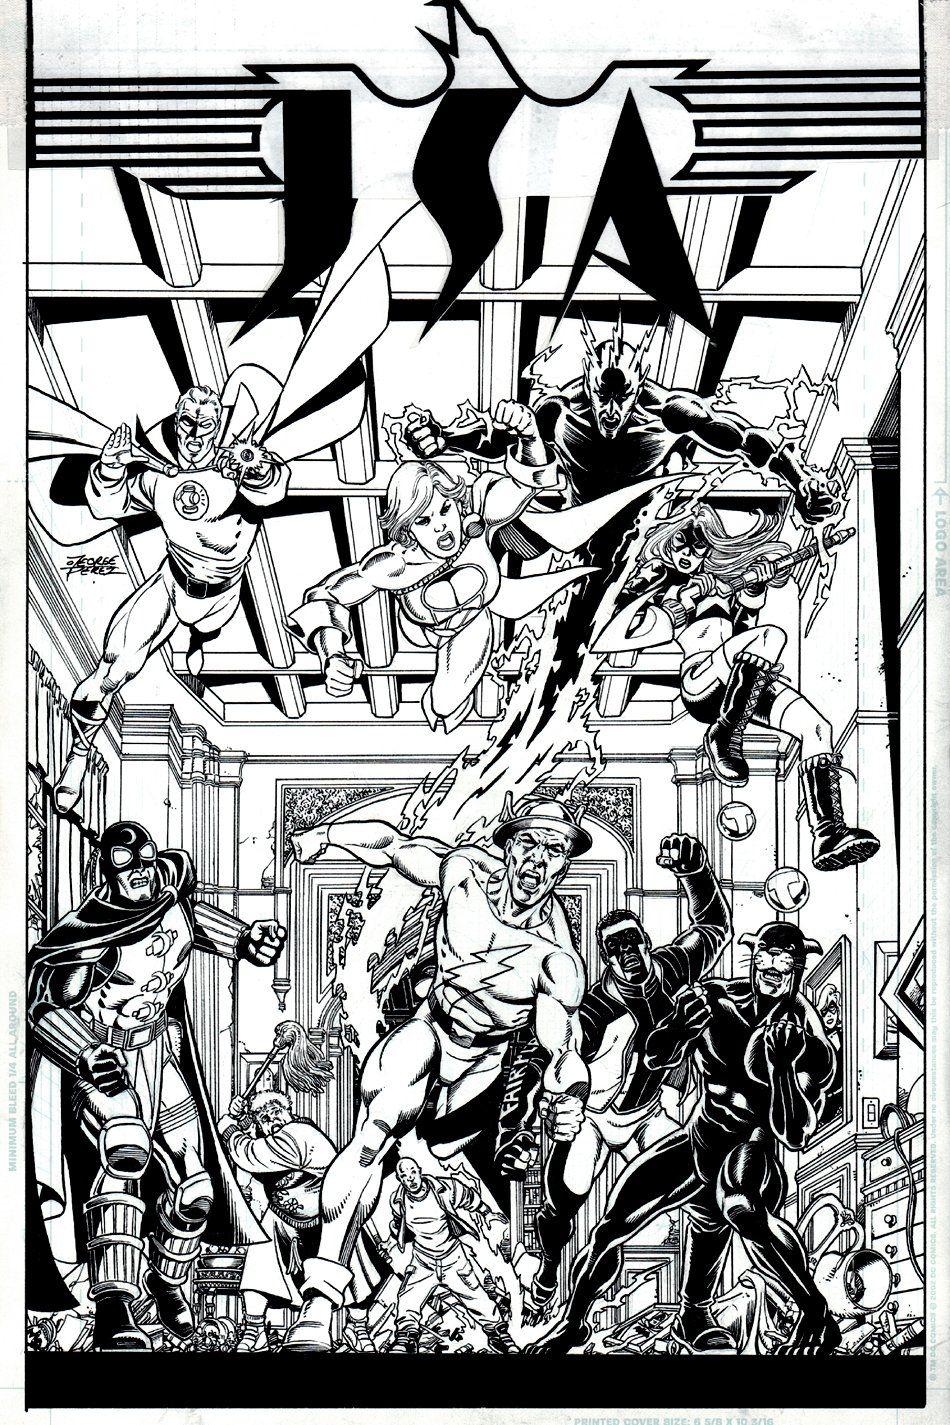 Comic Art For Sale from RomitaMan Original Art, JSA 84